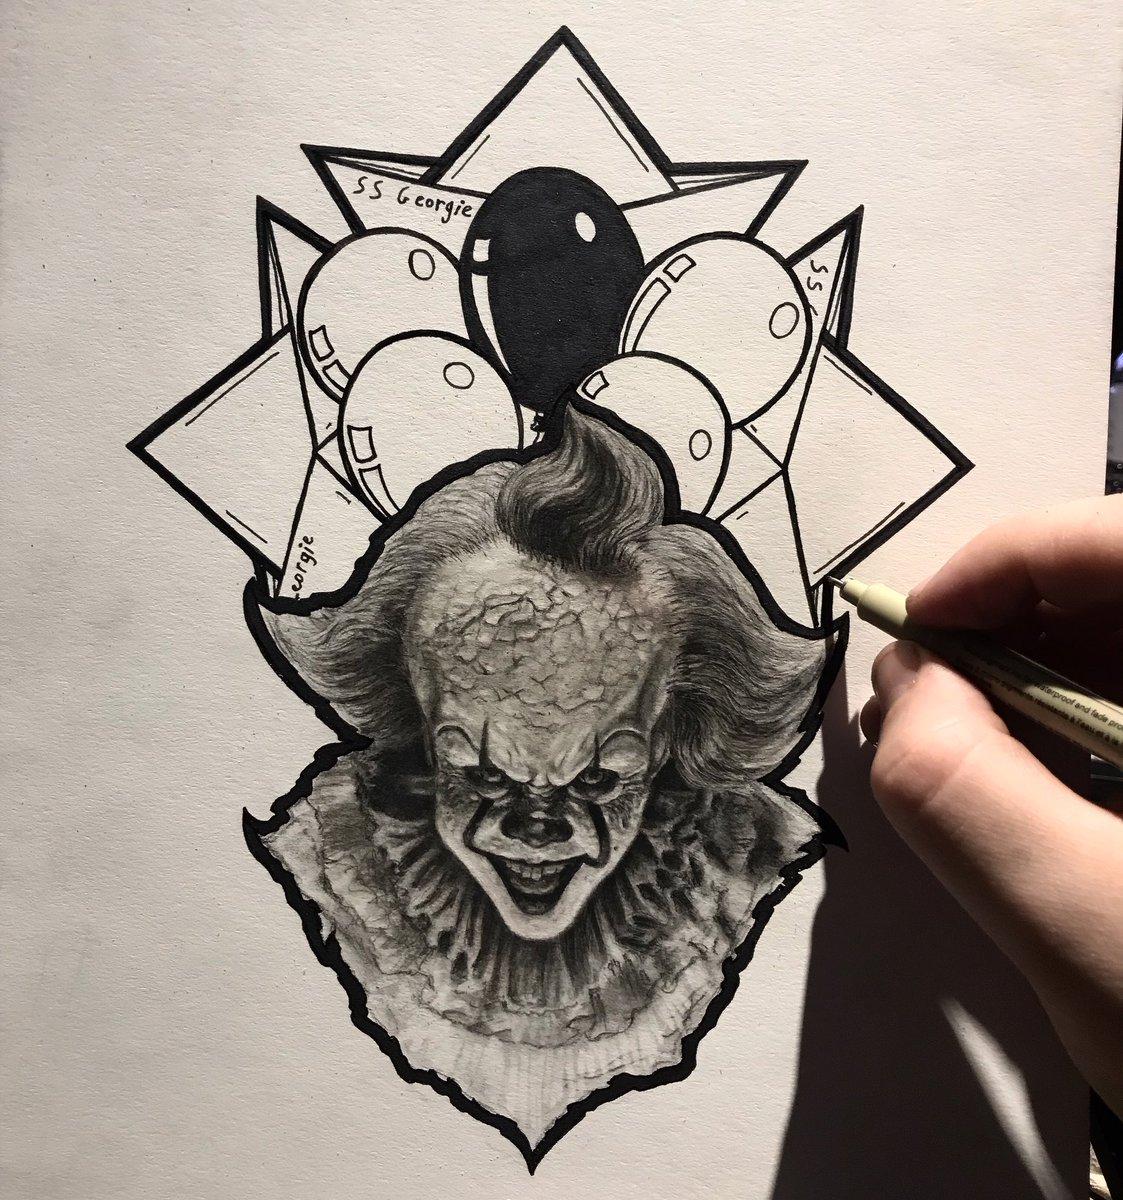 Drawing nycart art sketch horrorfan horror pic twitter com 4isvujqm2w